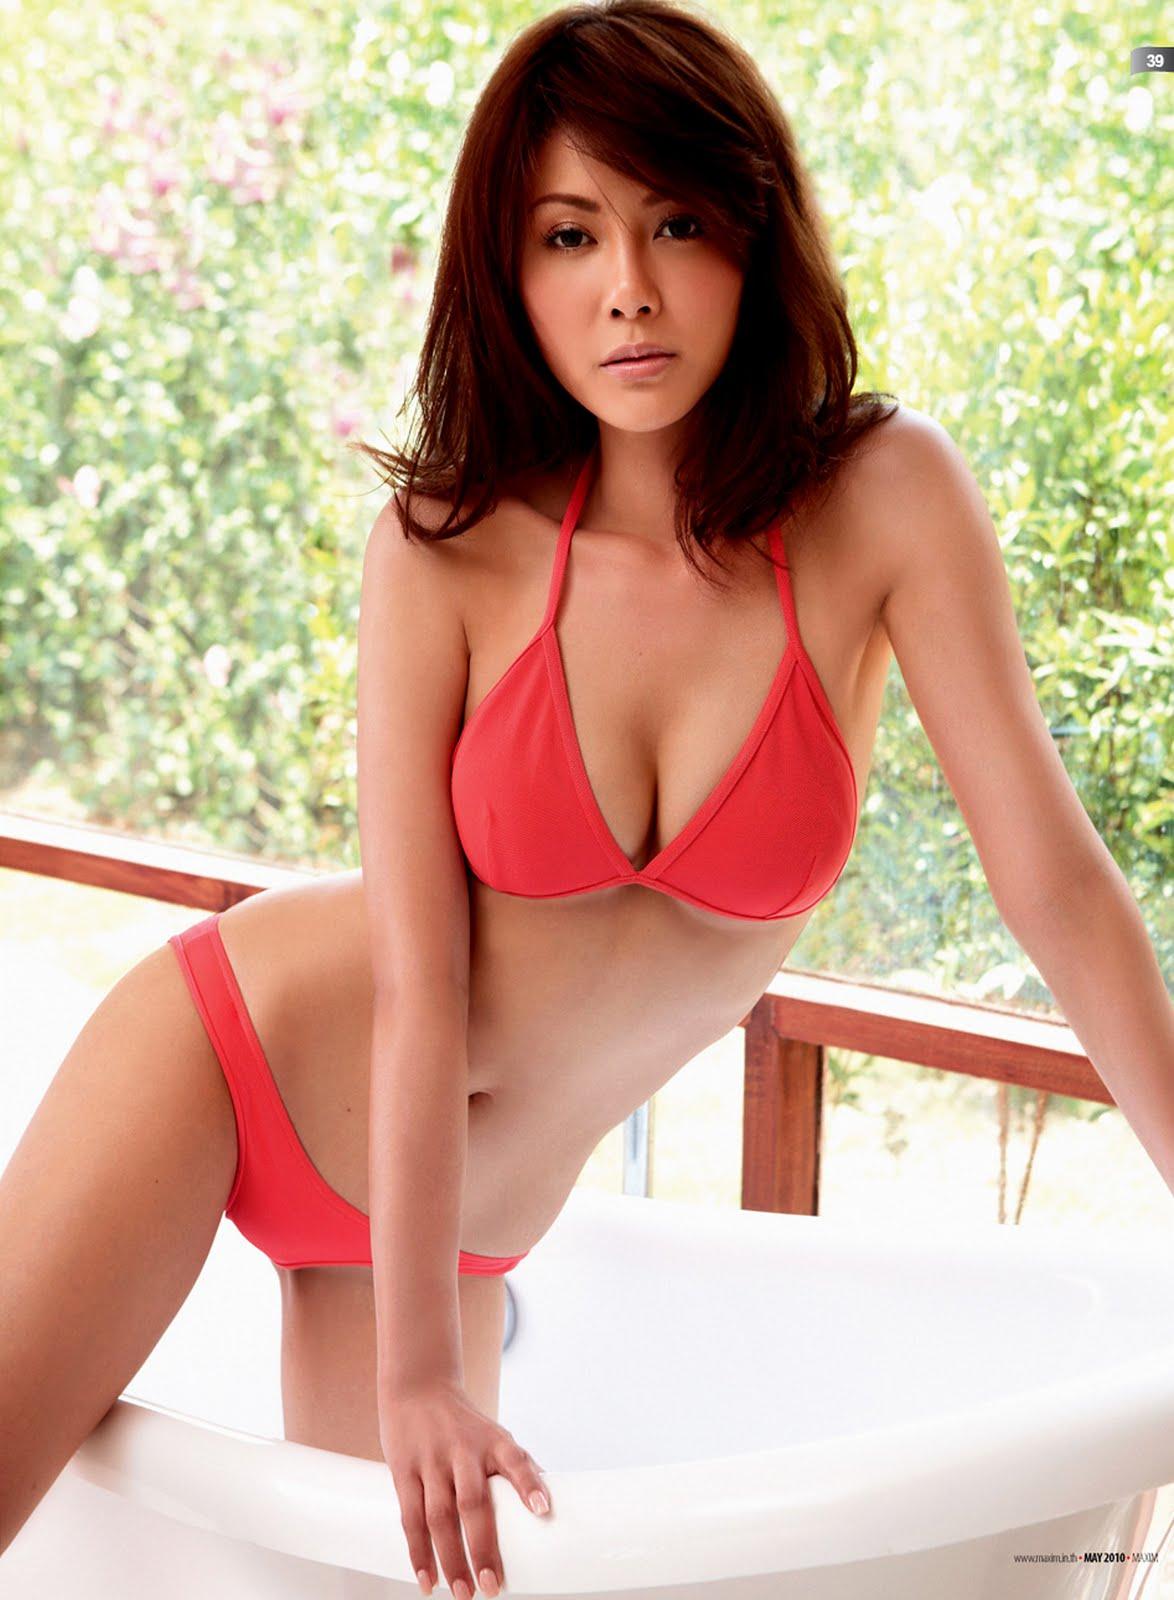 natural breast lingerie pics